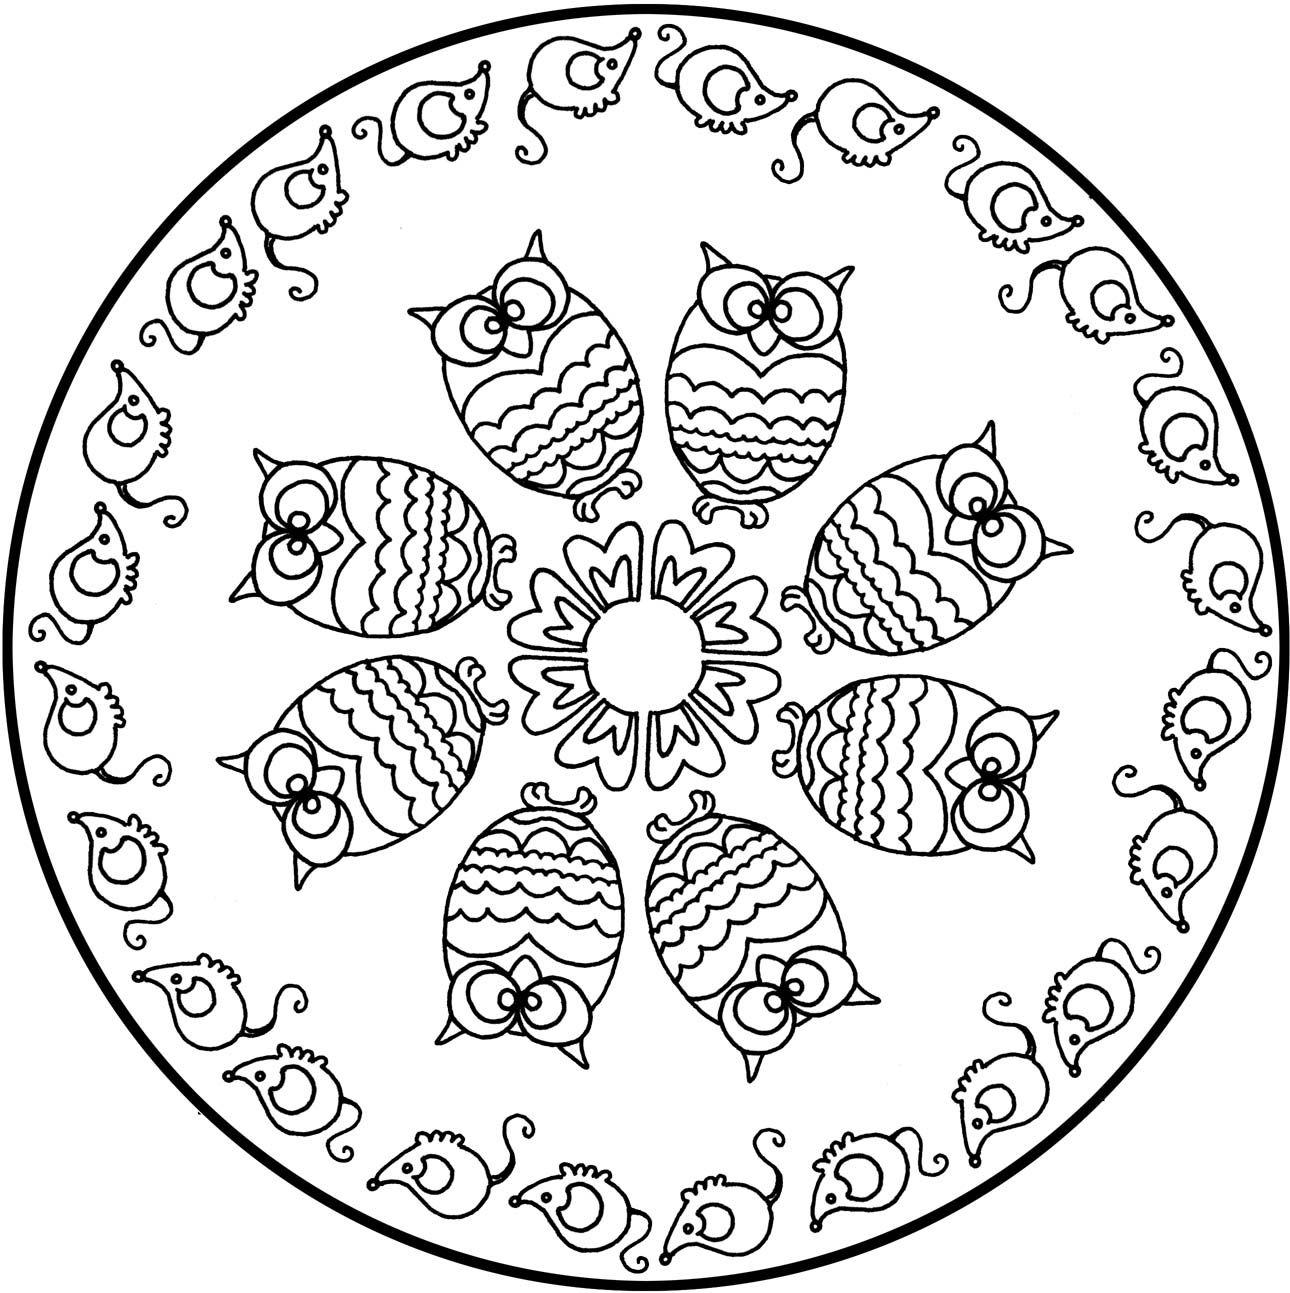 mandalas animales para colorear - Buscar con Google   Mandalas ...